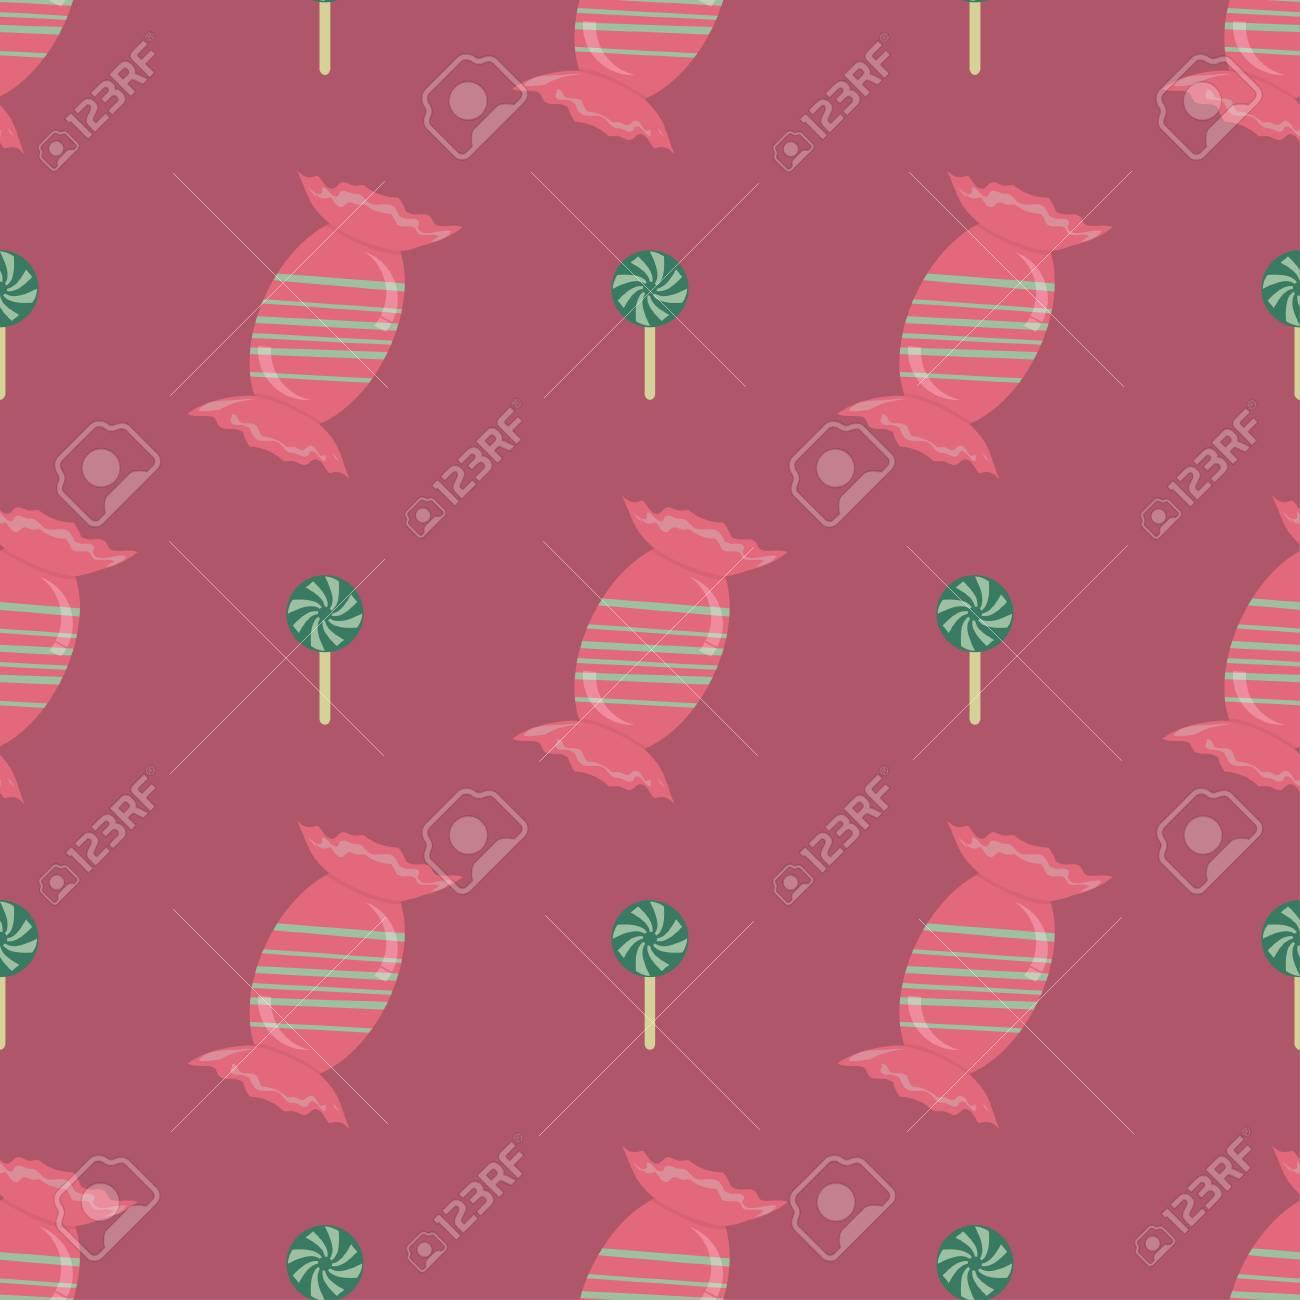 Weihnachtskarten Muster.Stock Photo